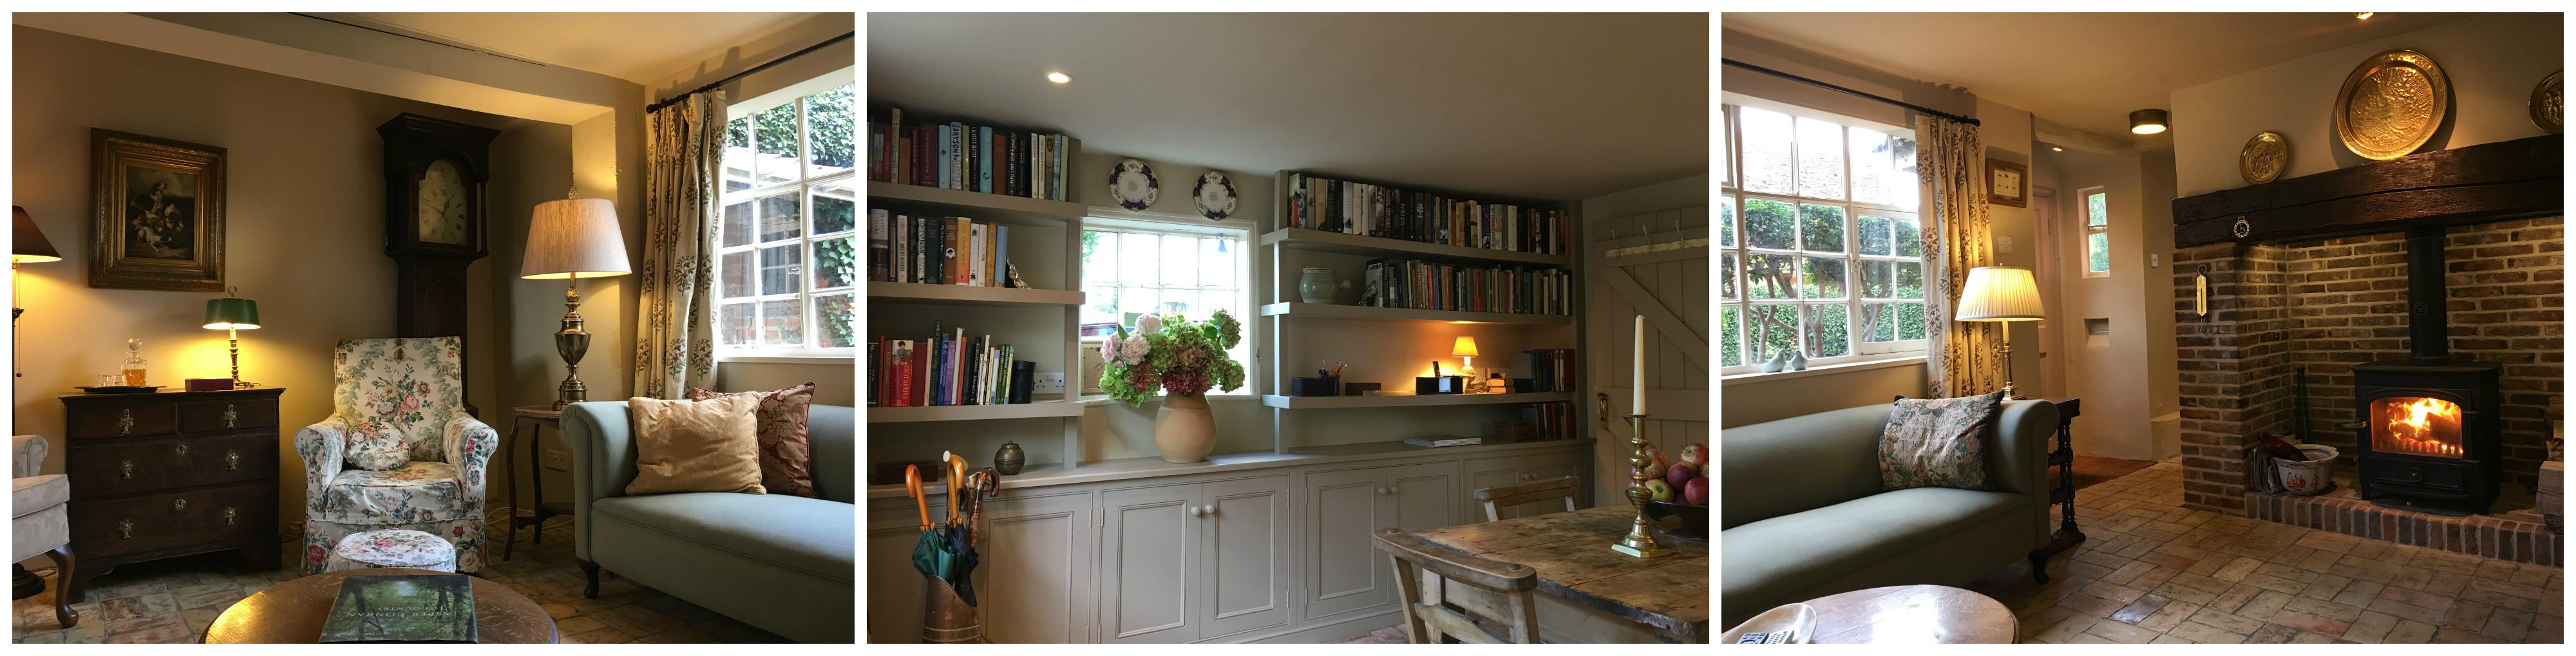 Lavenham Luxury Dog Friendly Holiday Cottage with Garden